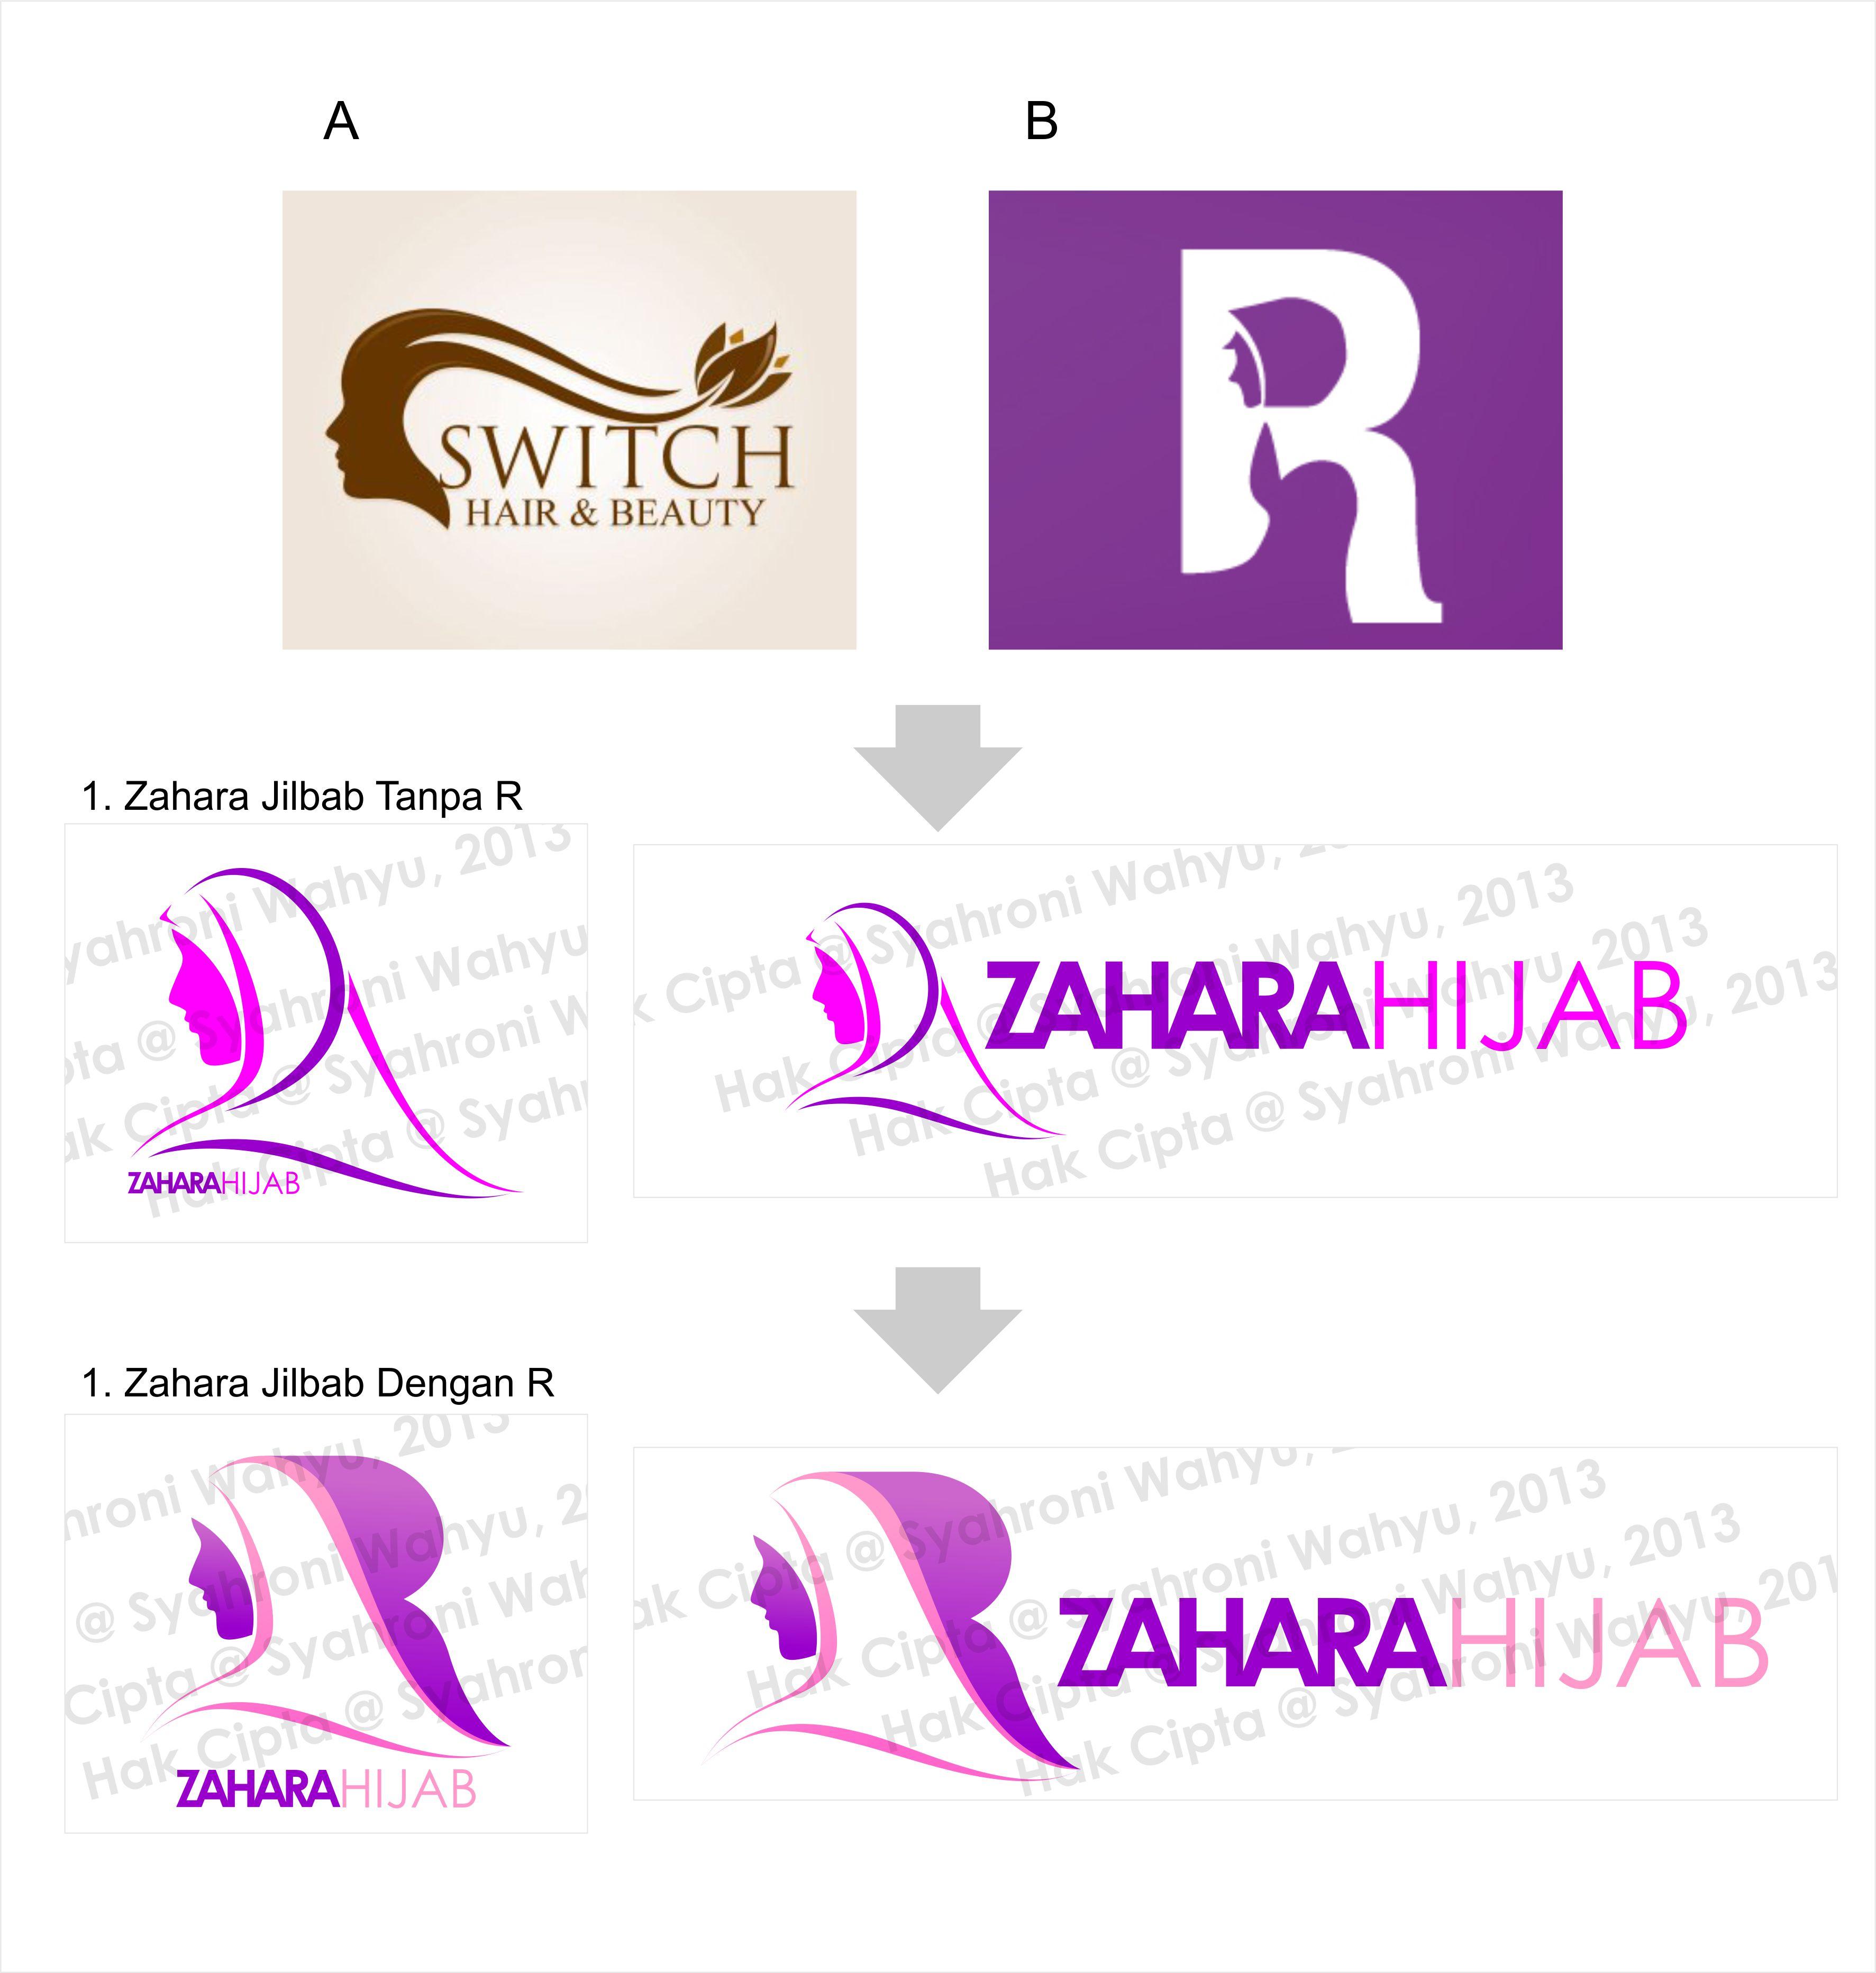 Tugas Mandiri Desain Grafis A/B (1)